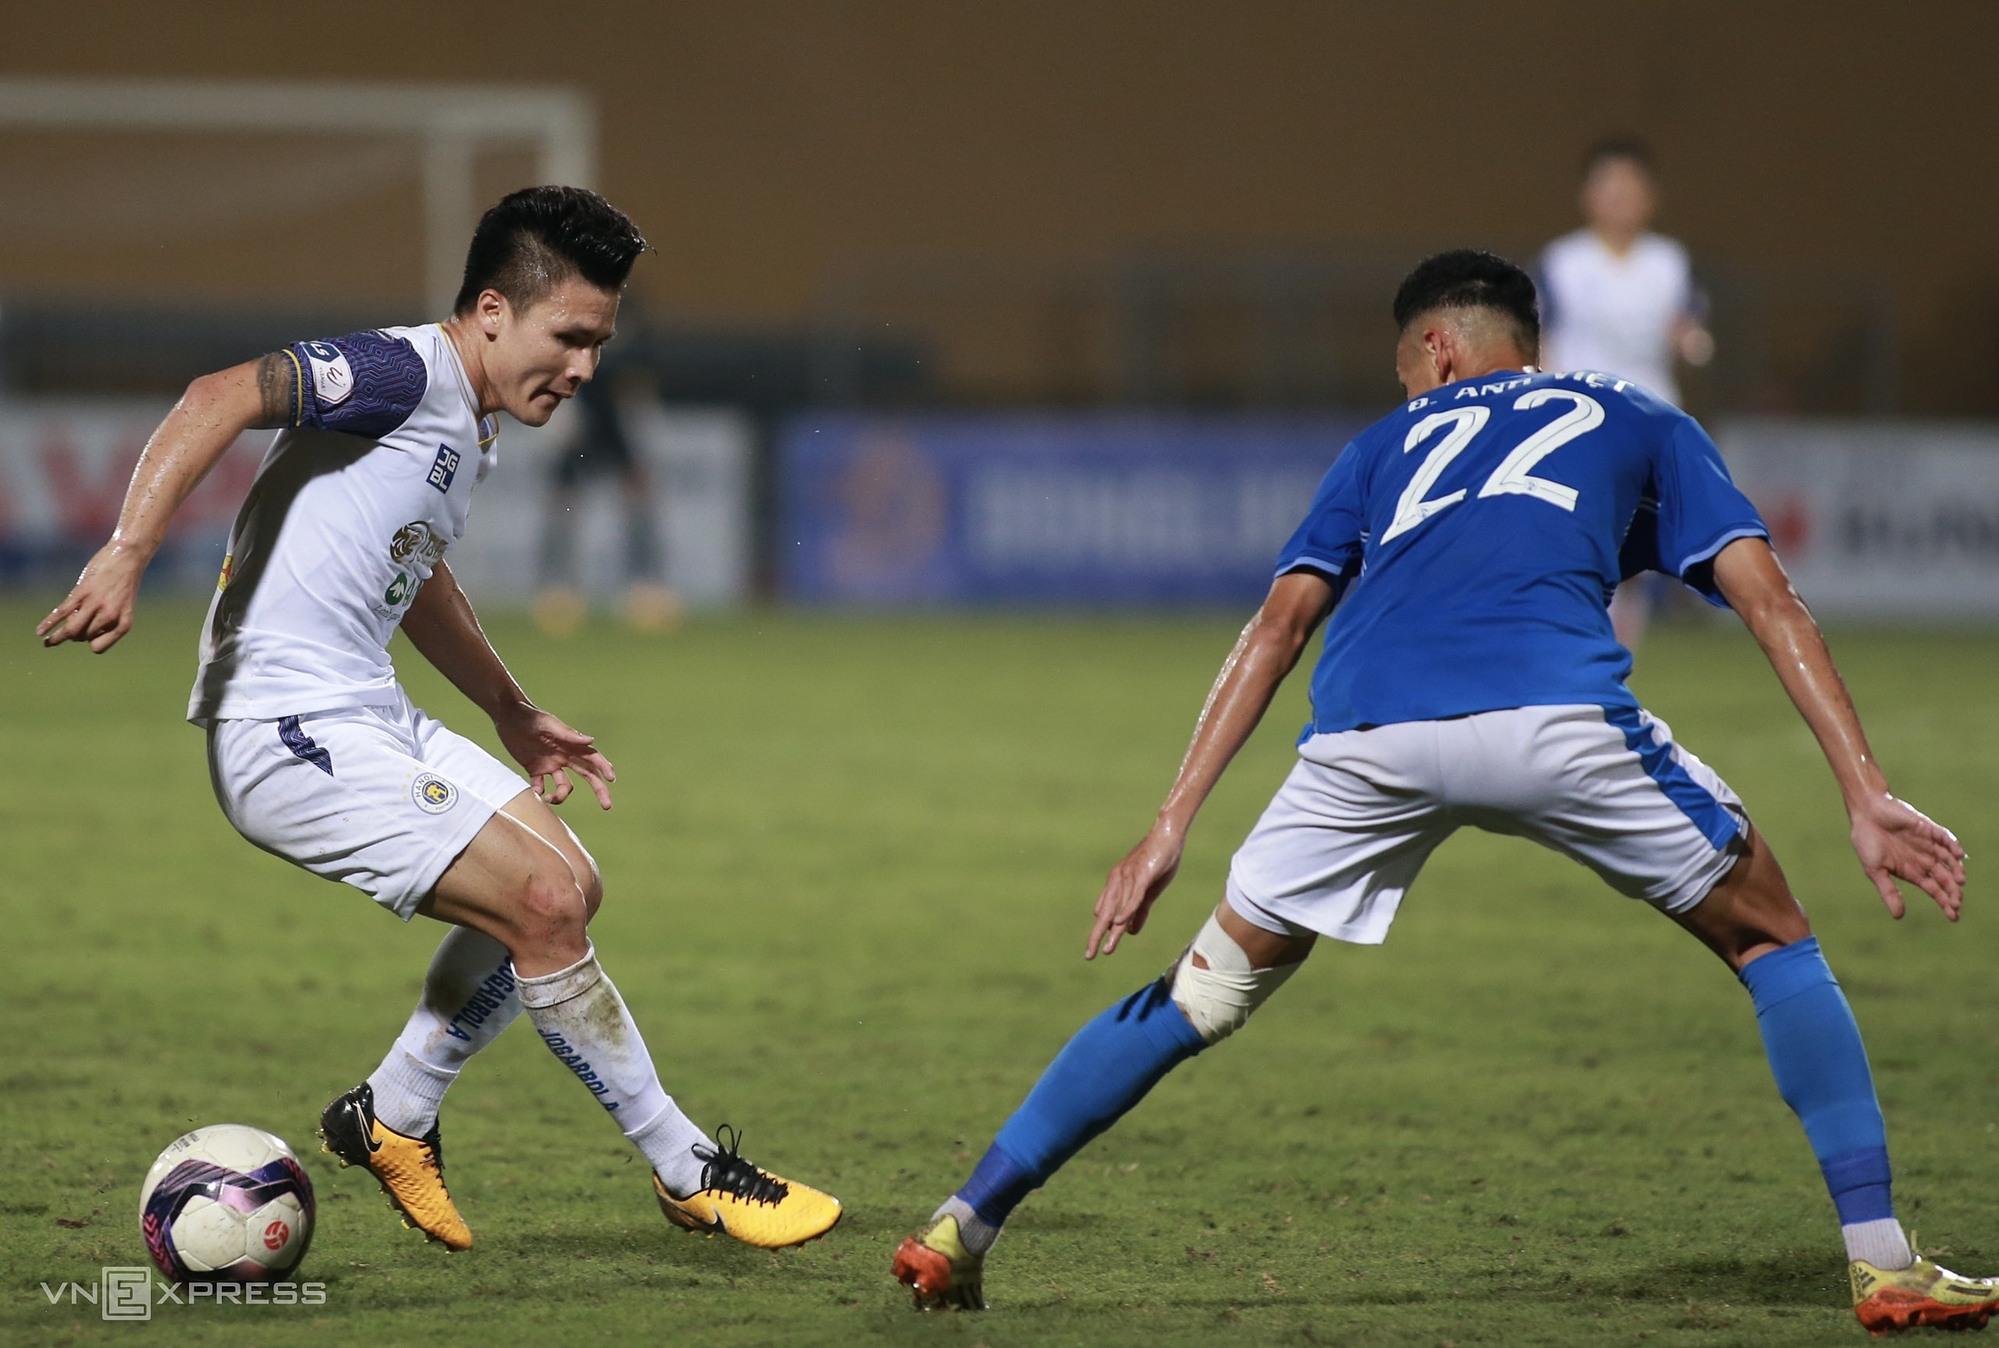 Setelah kemenangan 4-0 atas Quang Ninh, Hanoi FC (kemeja putih) Quang Hai akan memasuki seri terakhir dari empat pertandingan, fase I, kesulitan yang menjanjikan, bertemu HAGL hari ini, Binh Dinh pada 28 April, Saigon. FC pada 2 Mei dan SLNA 9/5.  Foto: Lam Thoa